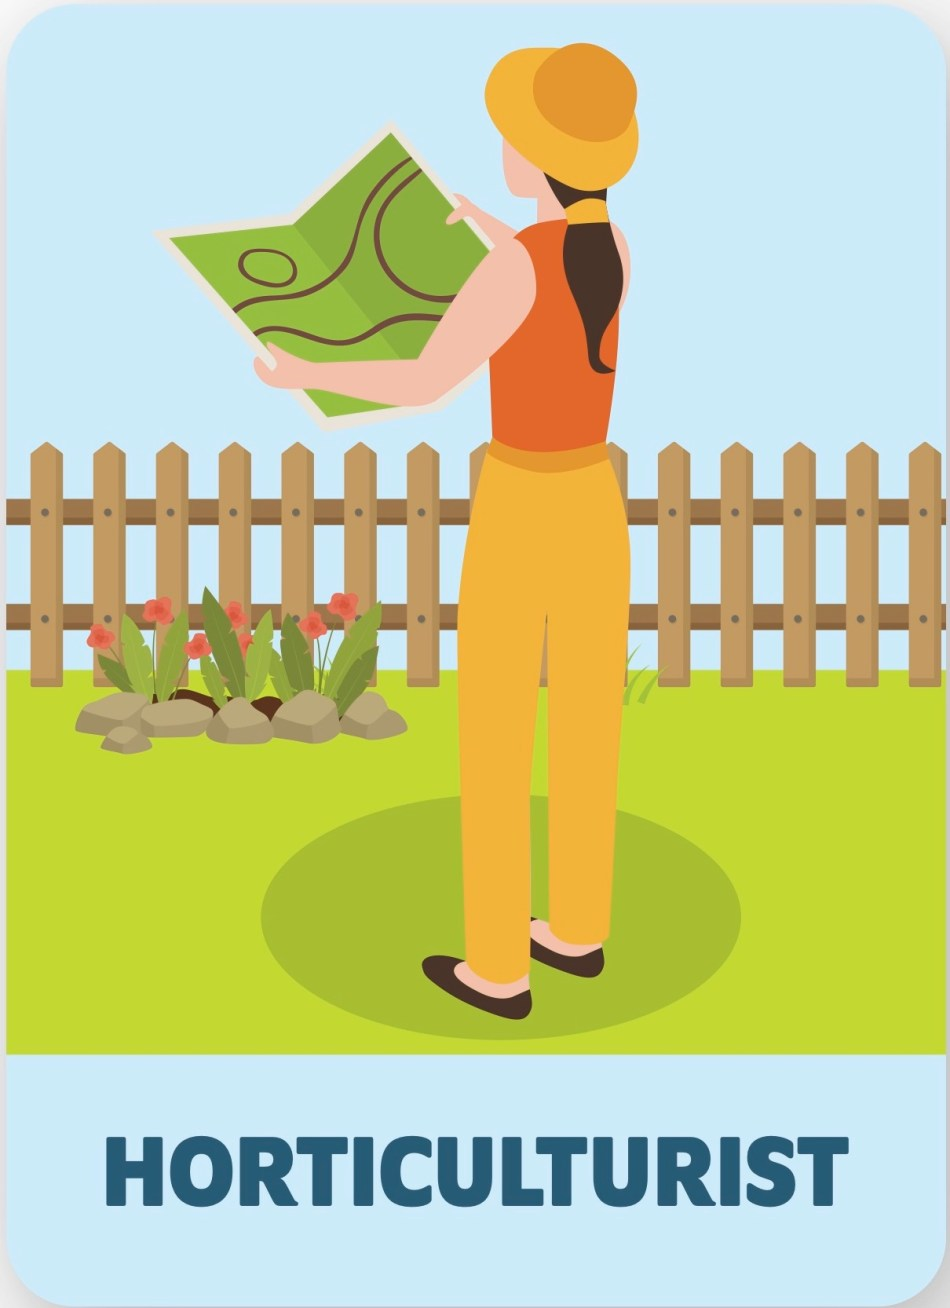 Illustration of horticulturist